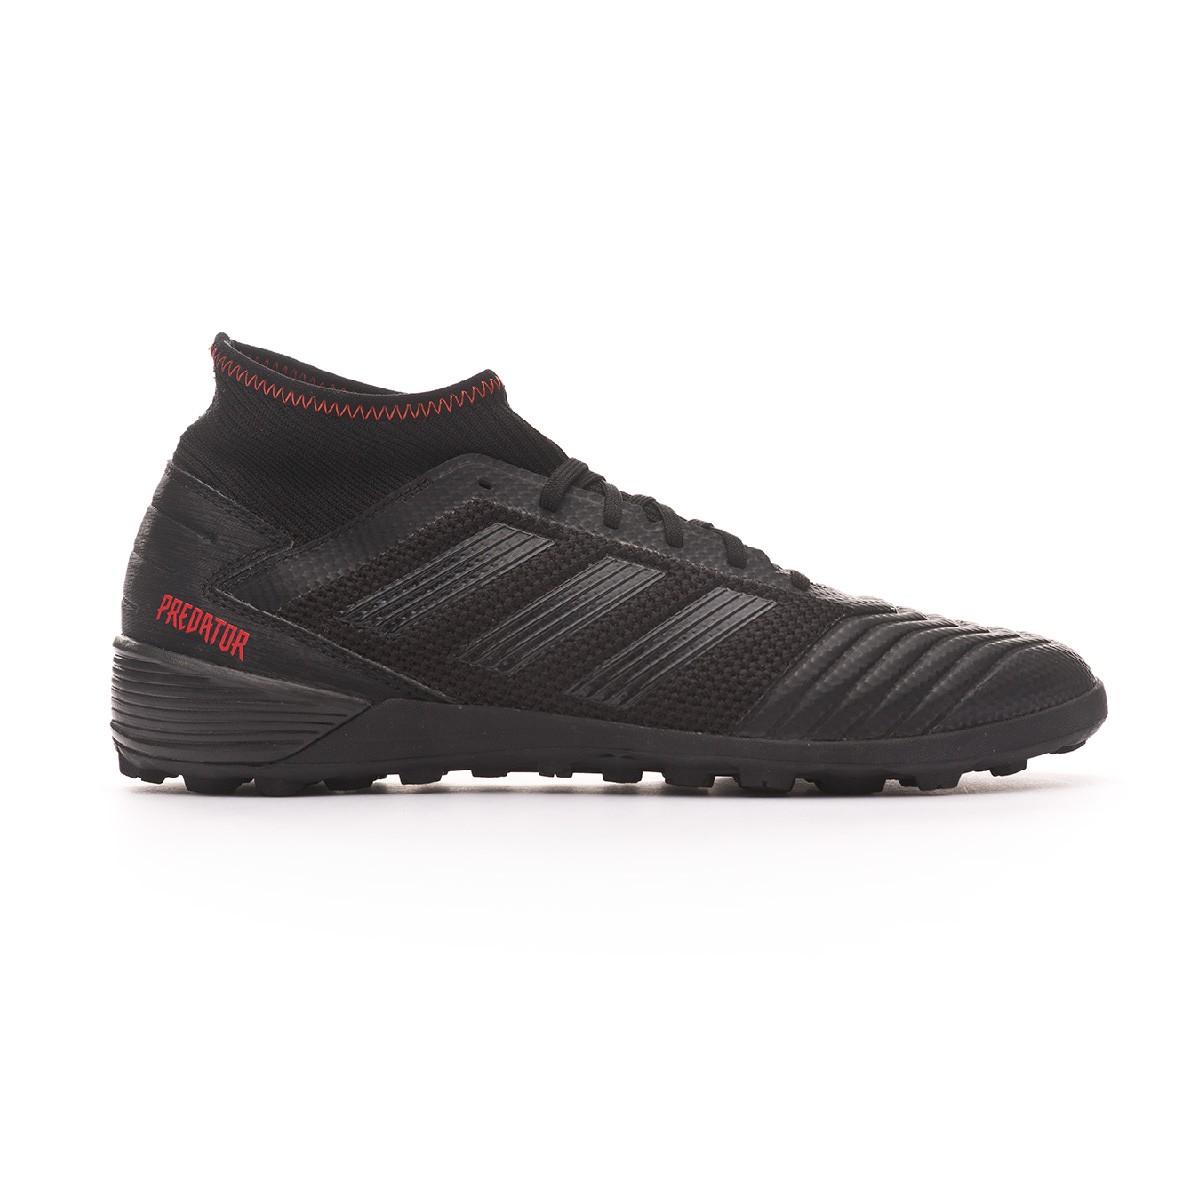 c4fb7d2e7653 Football Boot adidas Predator Tango 19.3 Turf Core black-Active red -  Tienda de fútbol Fútbol Emotion